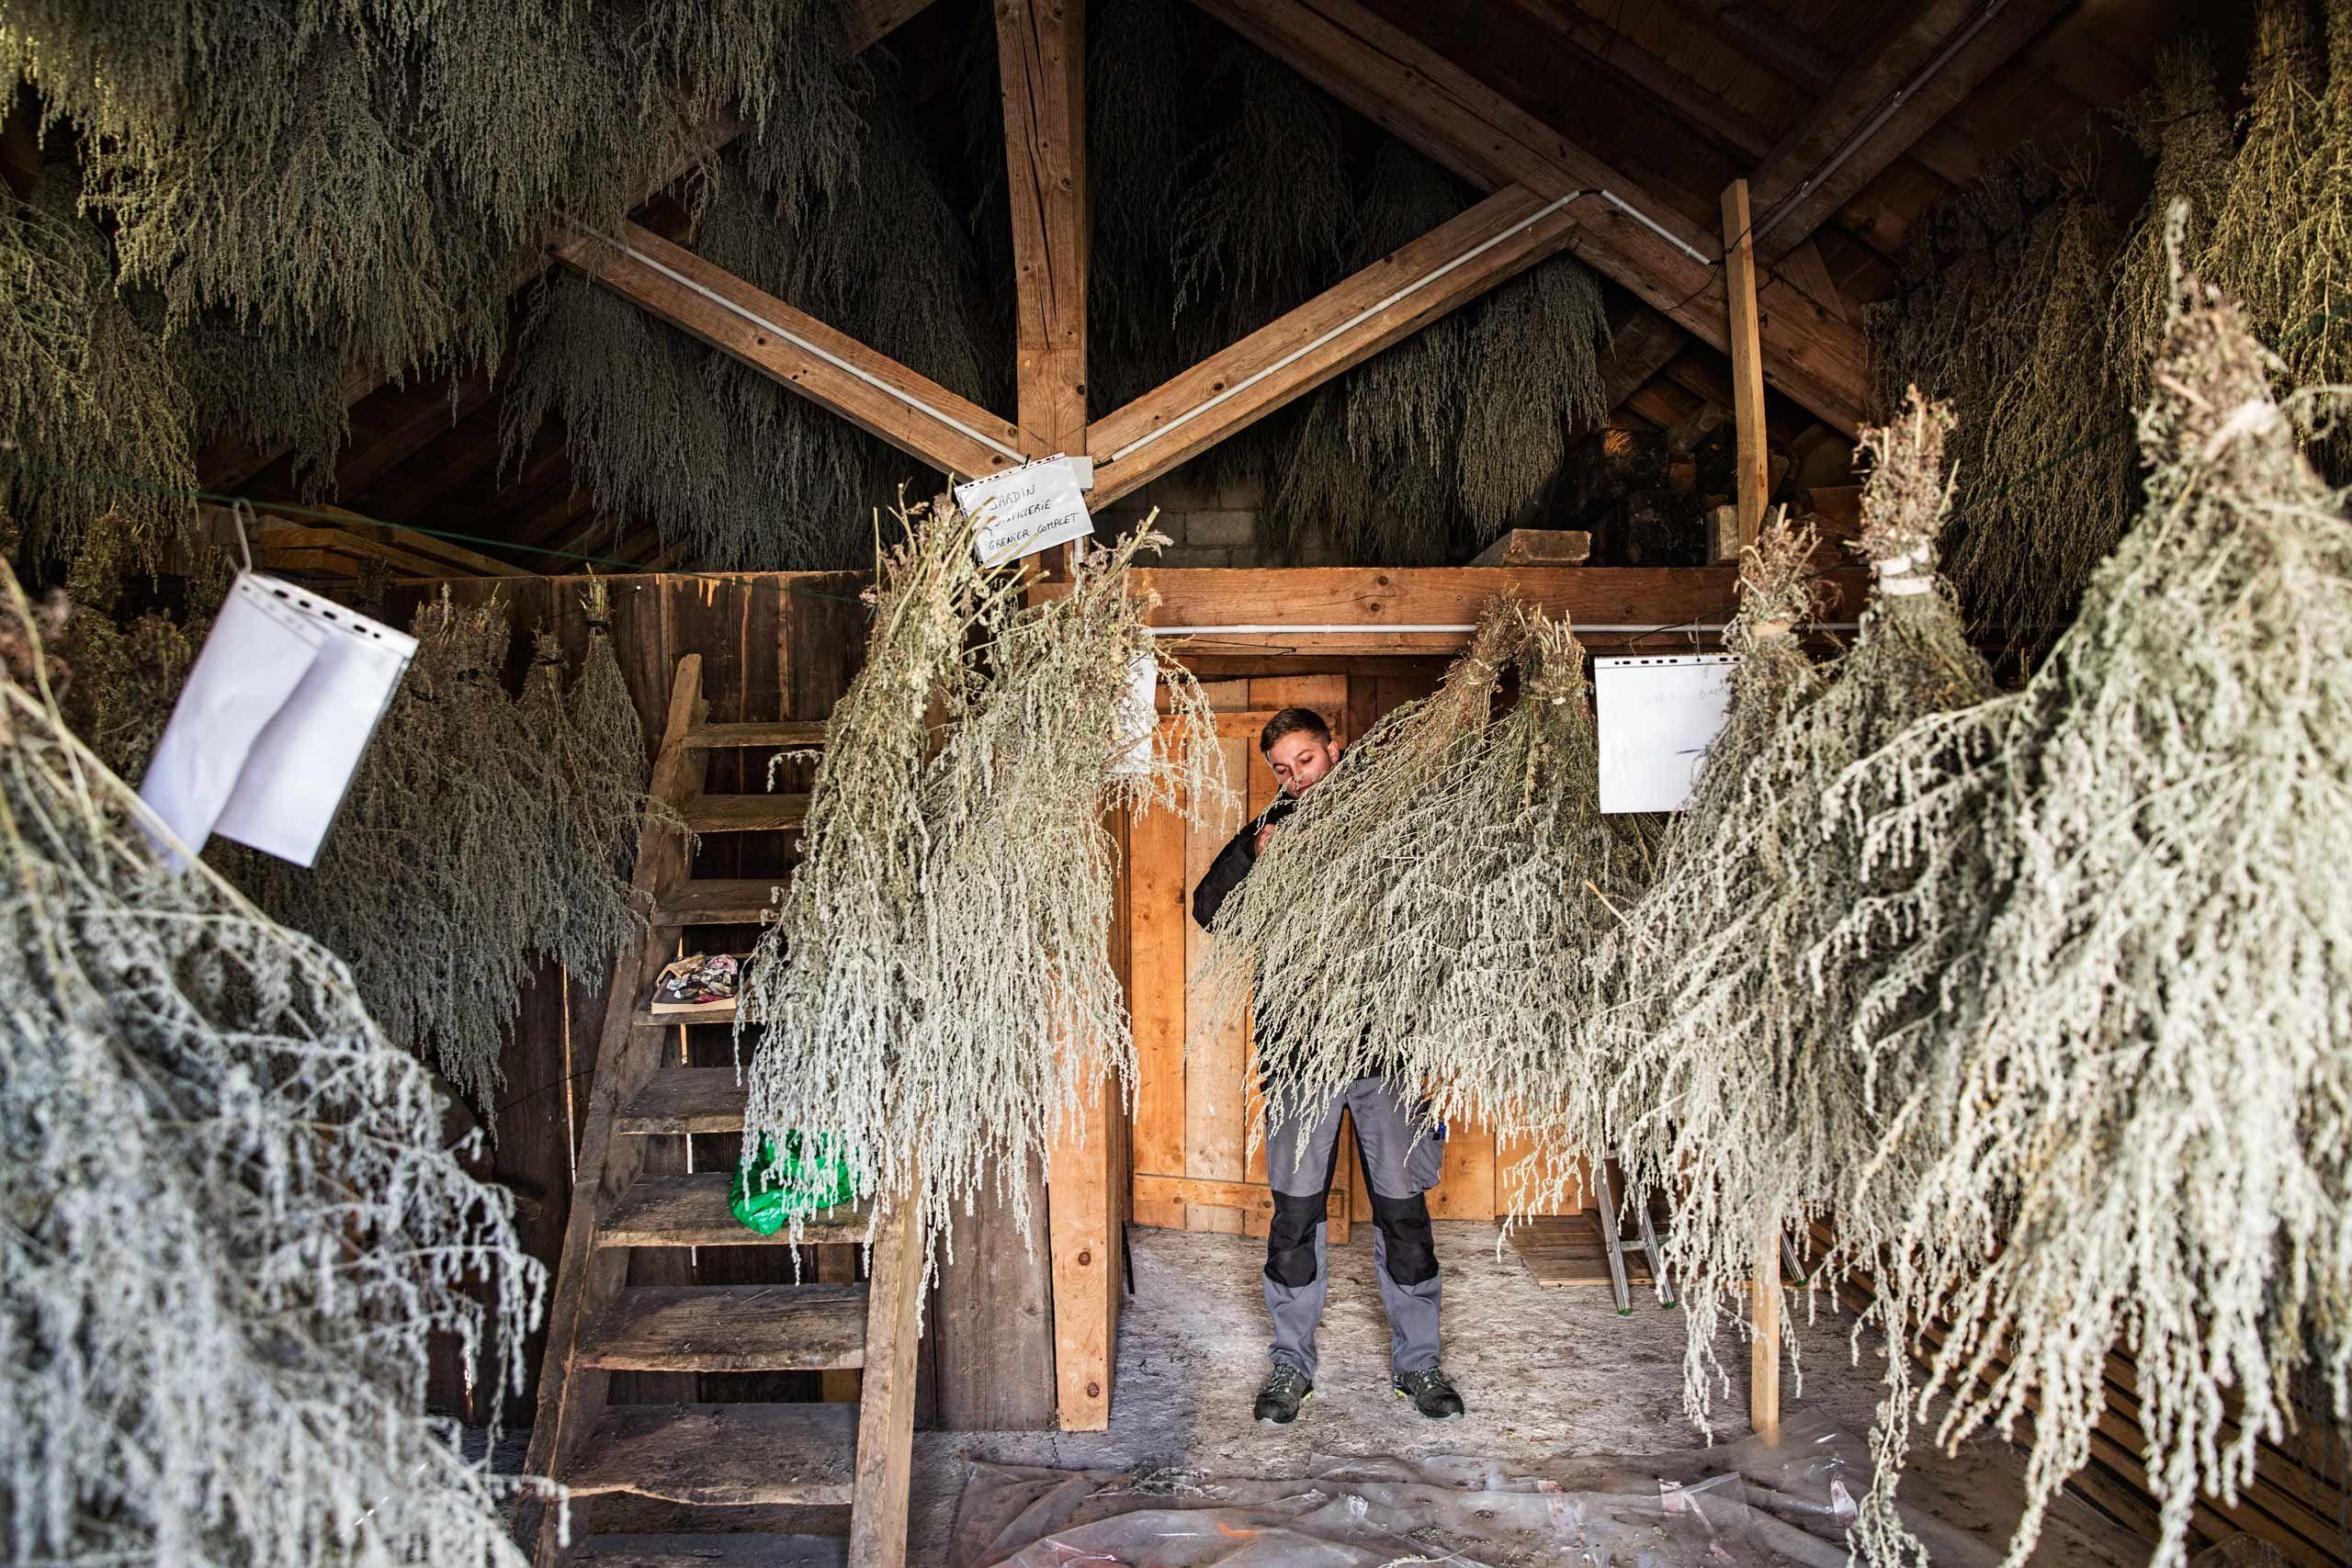 Pierre Guy Inside a Barn Full of Drying Absinthe Plants